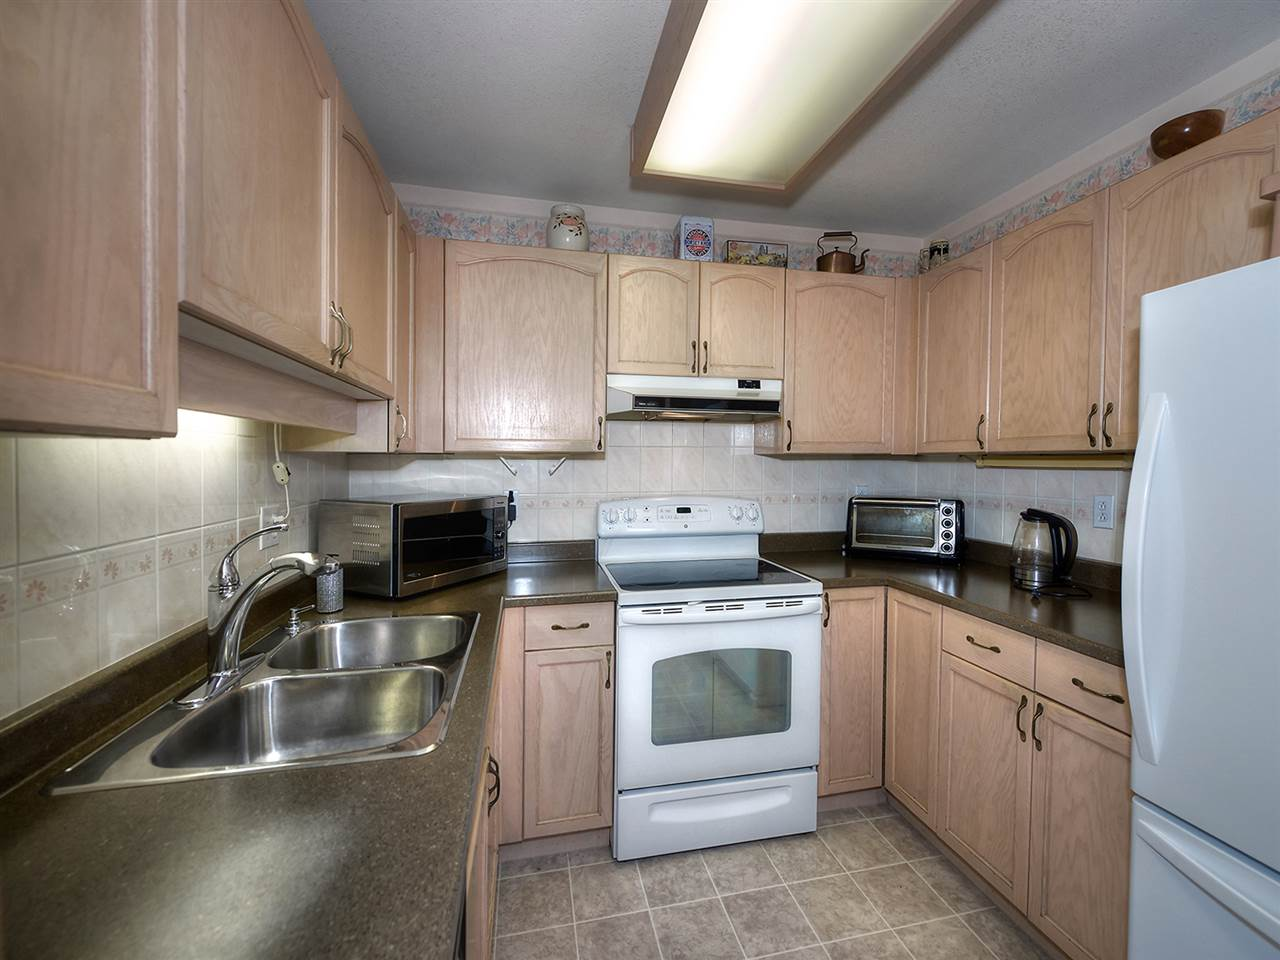 Condo Apartment at 301 1172 55 STREET, Unit 301, Tsawwassen, British Columbia. Image 10